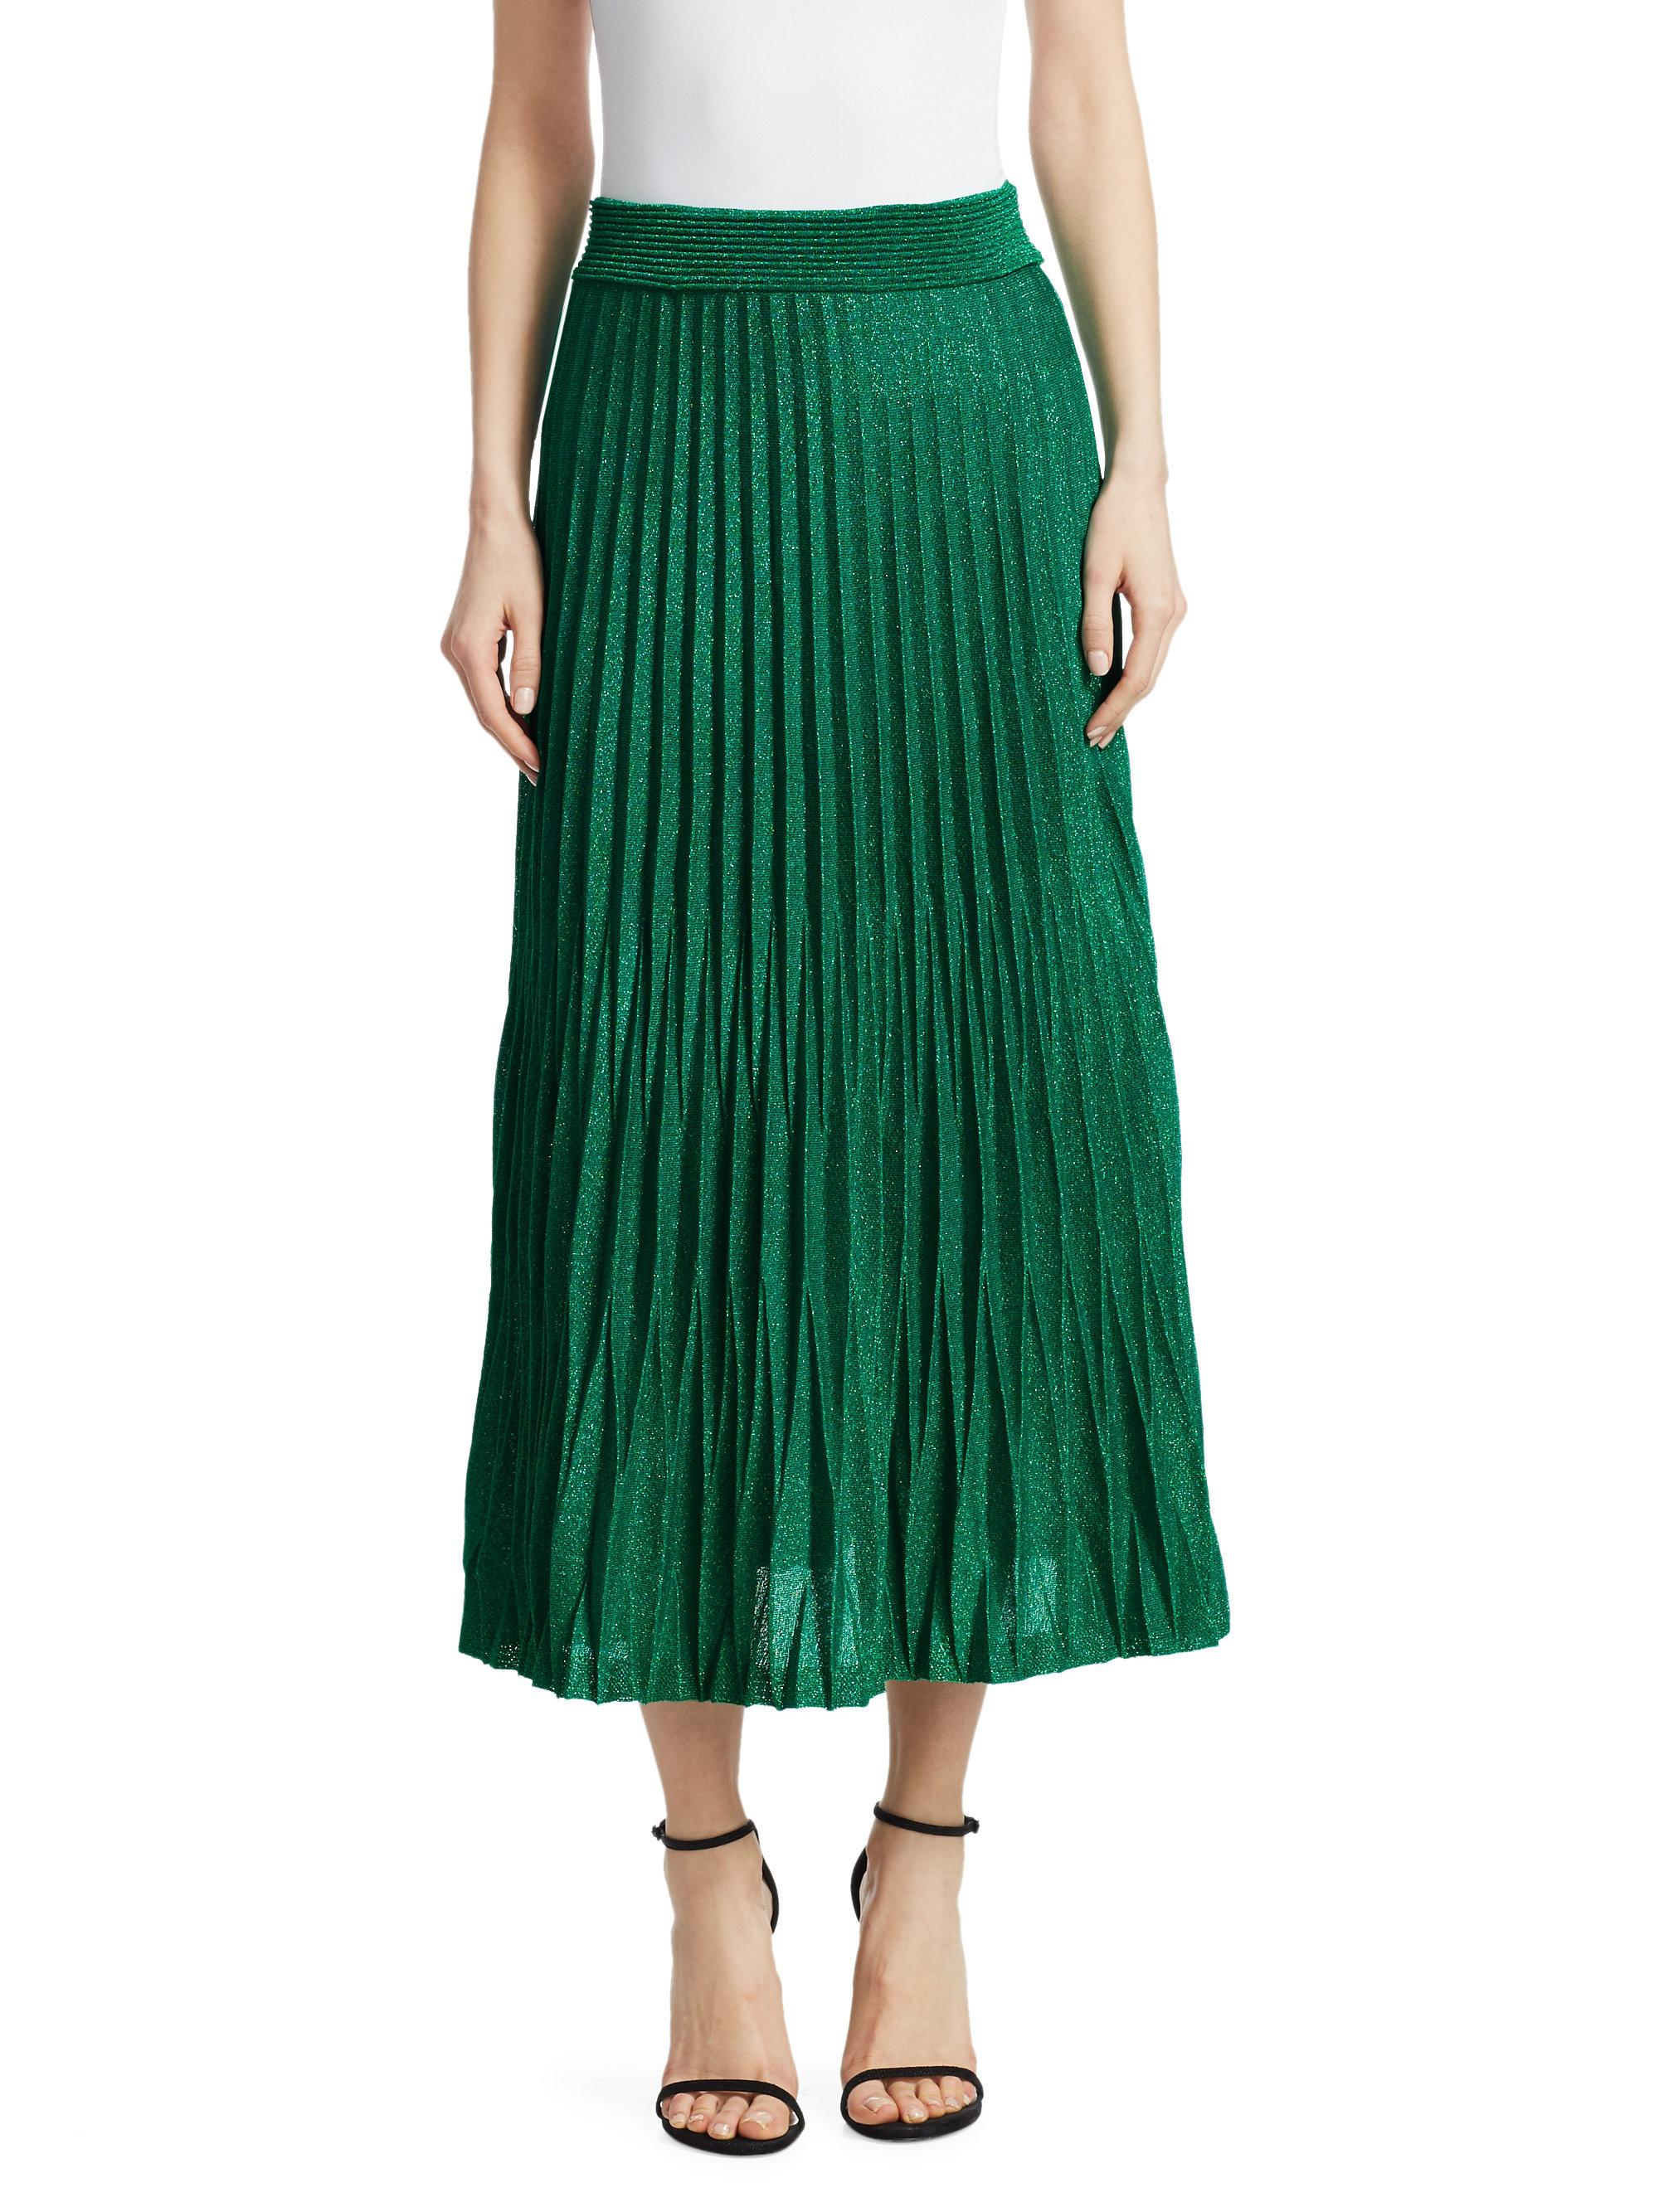 e8c7dbe5e4 Maje Woman Plissé Metallic Jersey Midi Skirt Emerald in Green - Lyst